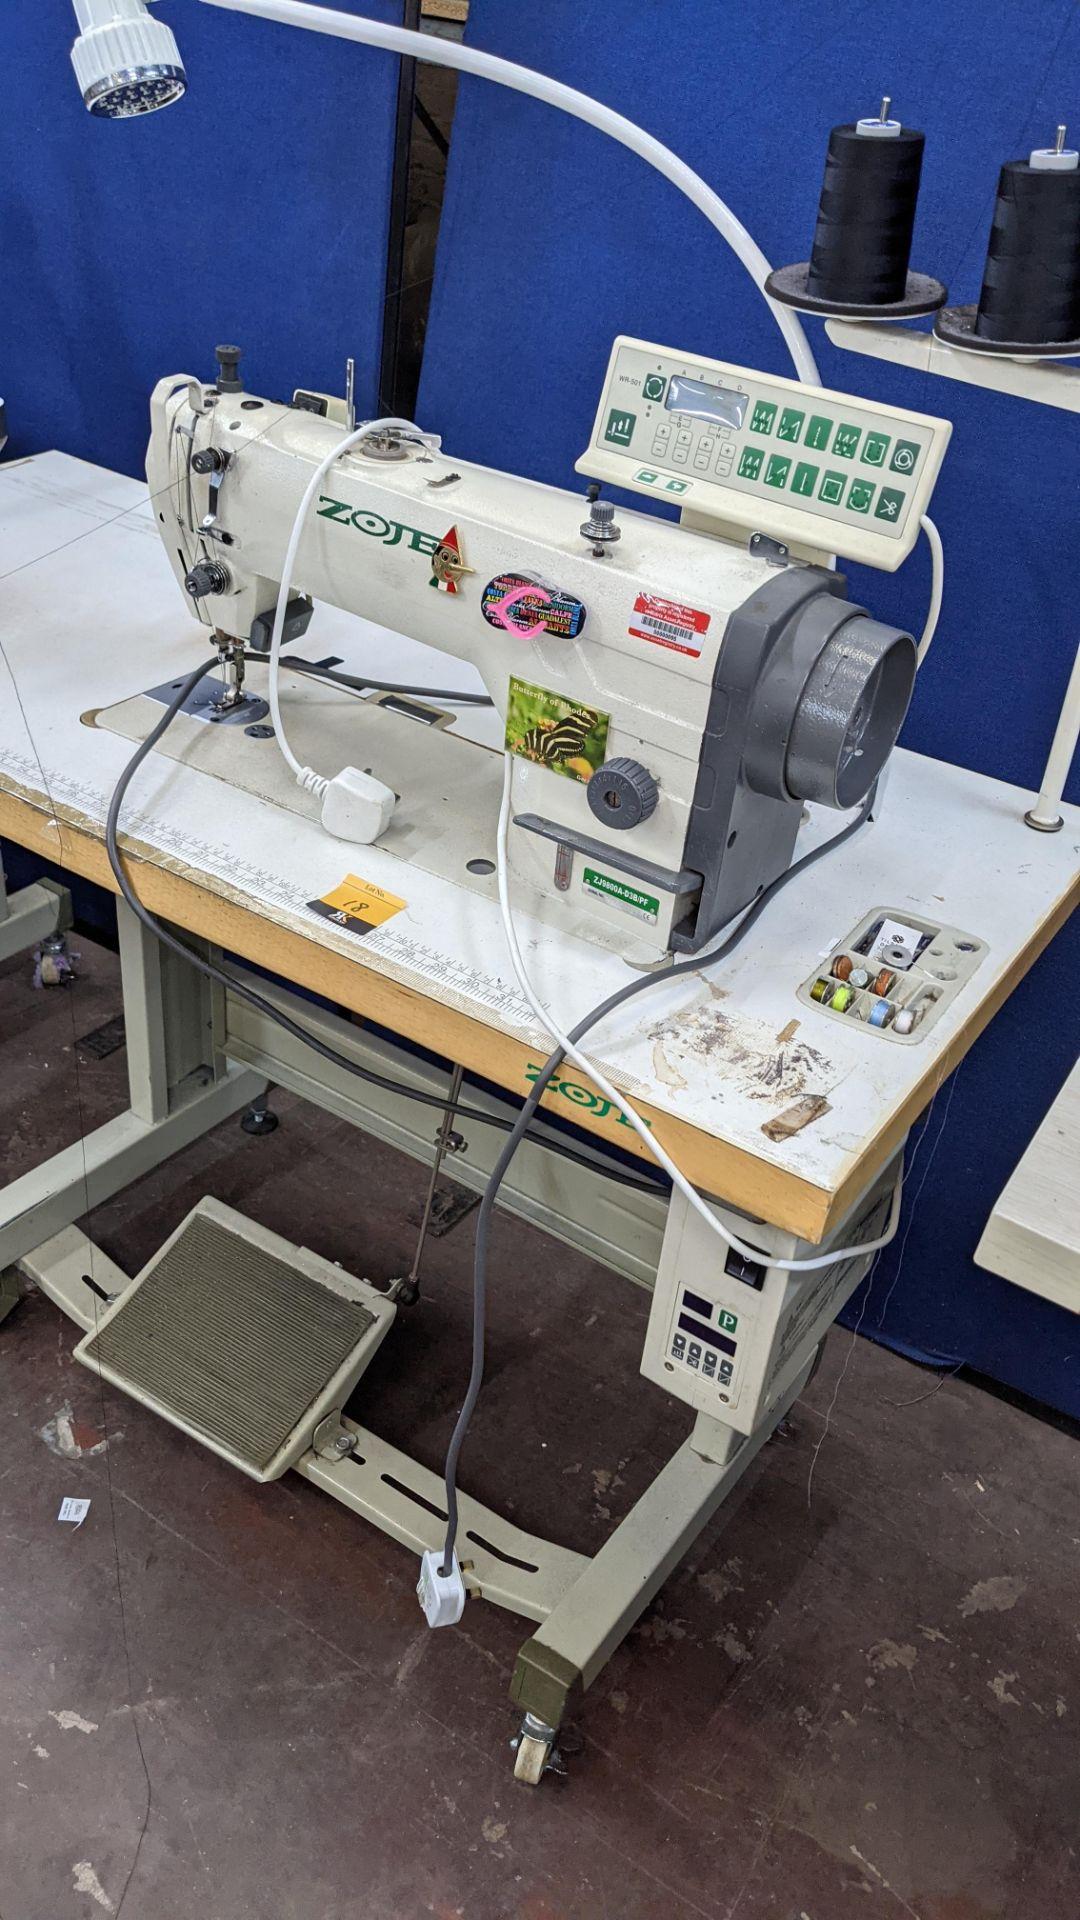 Zoje model ZJ9800A-D3B/PF lockstitch sewing machine with model WR-501 digital controller - Image 18 of 20